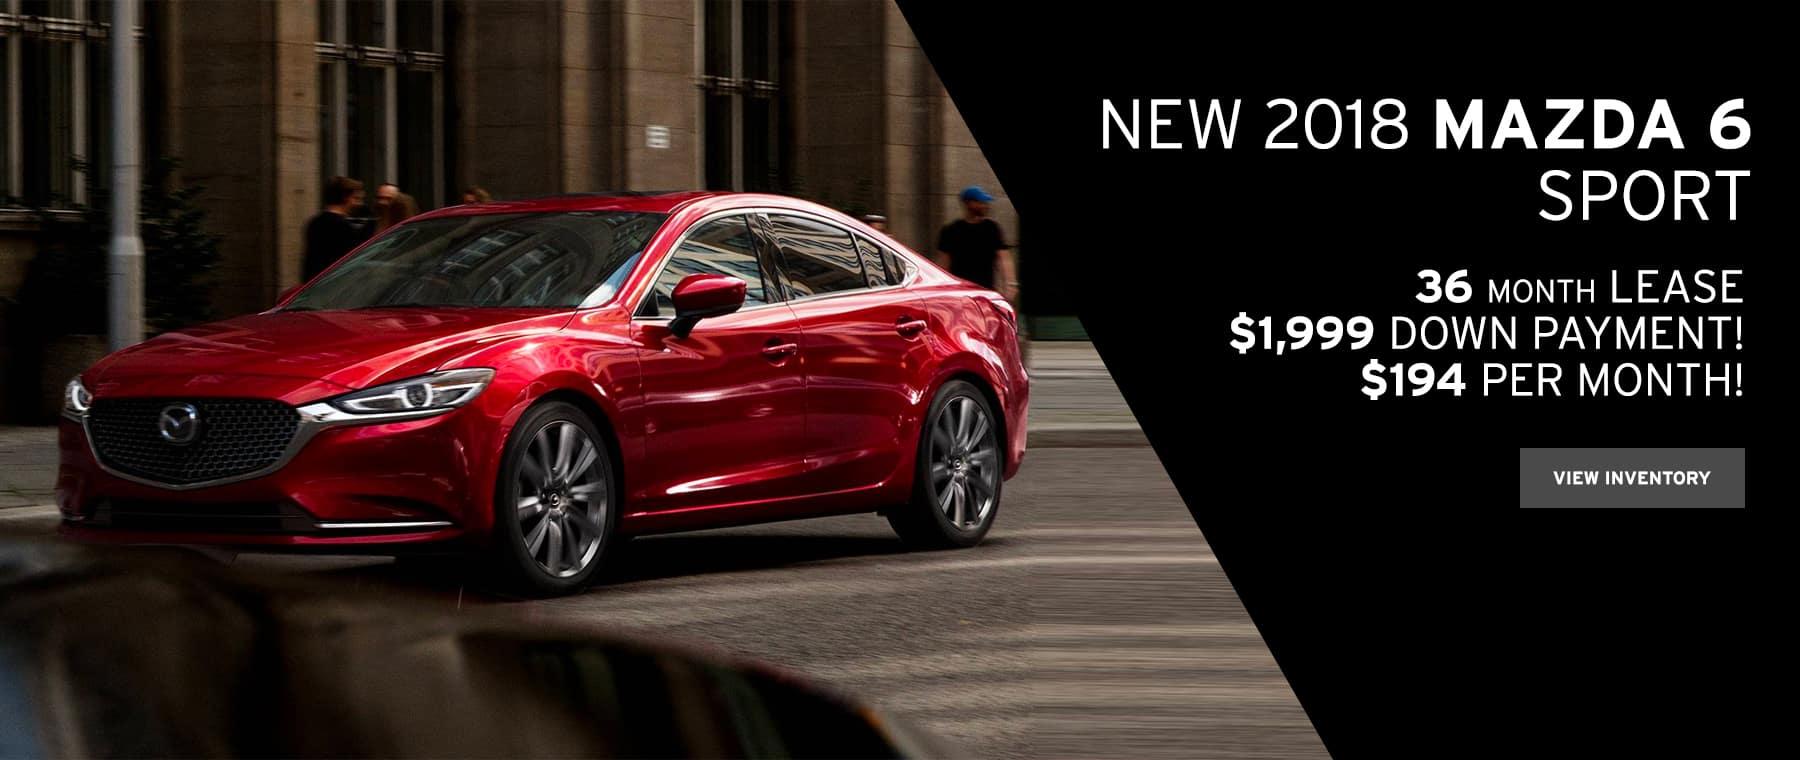 Mazda 6 October Lease Special